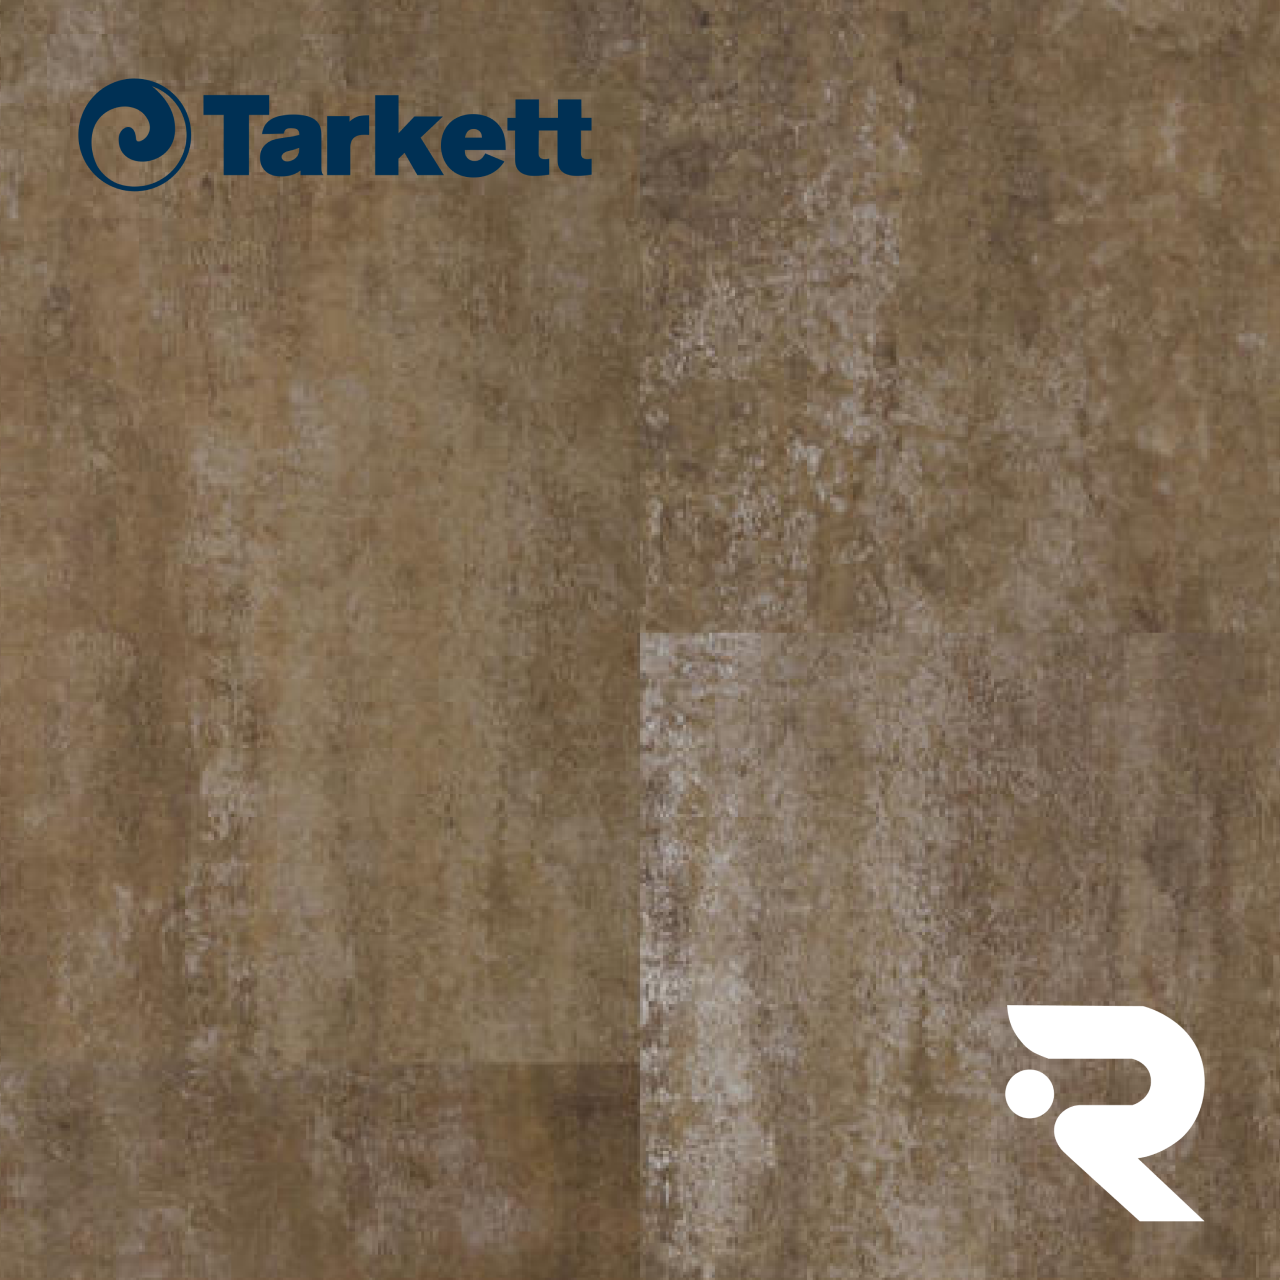 🌳 ПВХ плитка Tarkett | NEW AGE - ERA | Art Vinyl | 457 x 457 мм